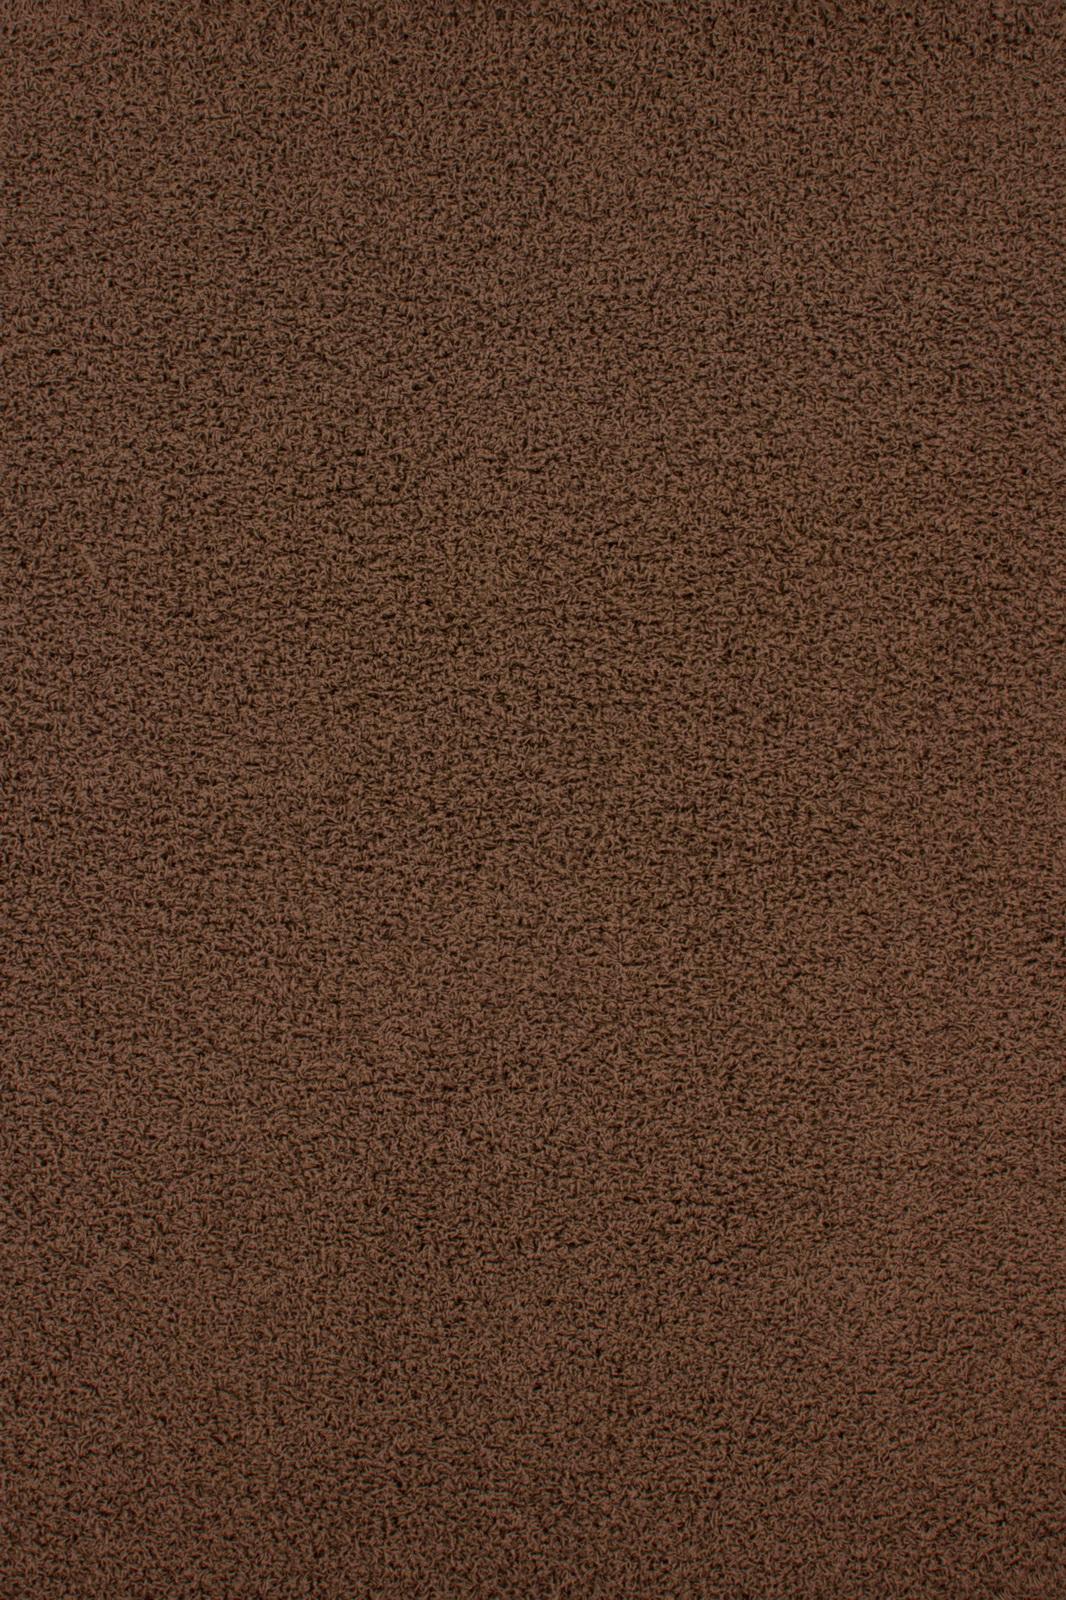 Kusový koberec Relax 150 Mocca (80 x 80 cm)